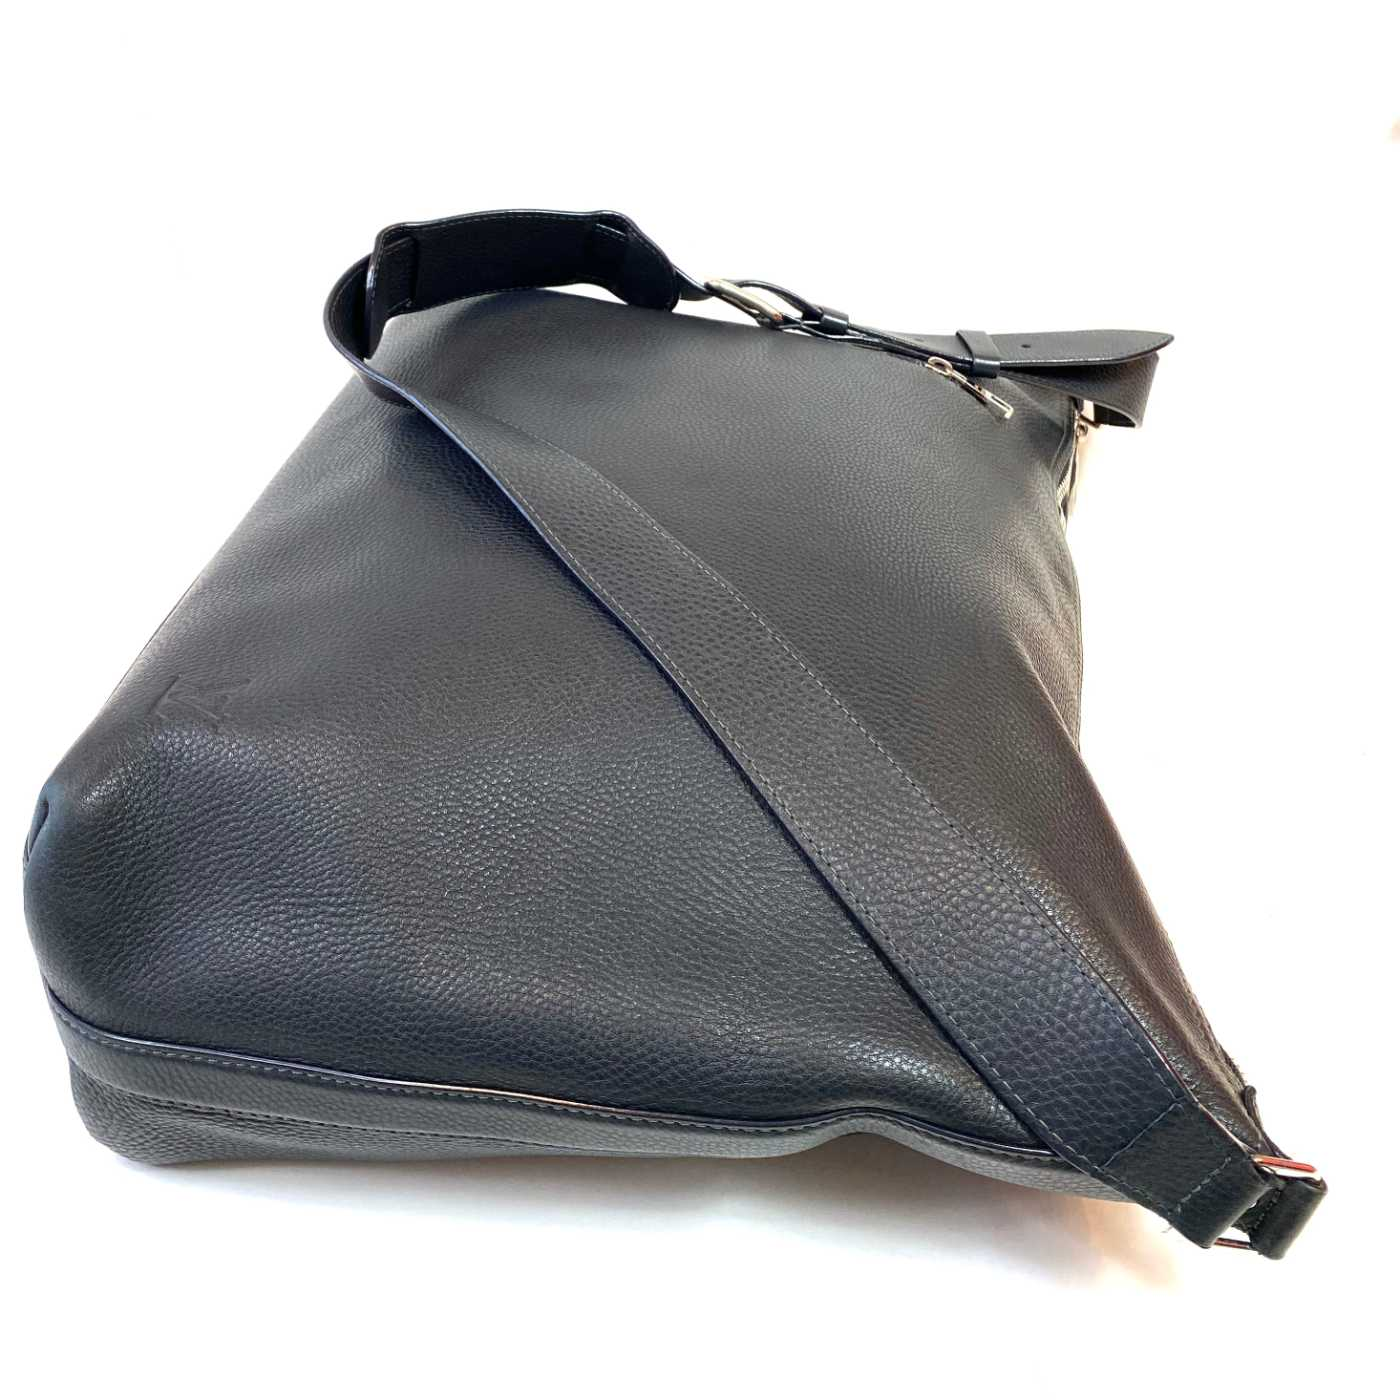 Bolsa Louis Vuitton Messenger Preta